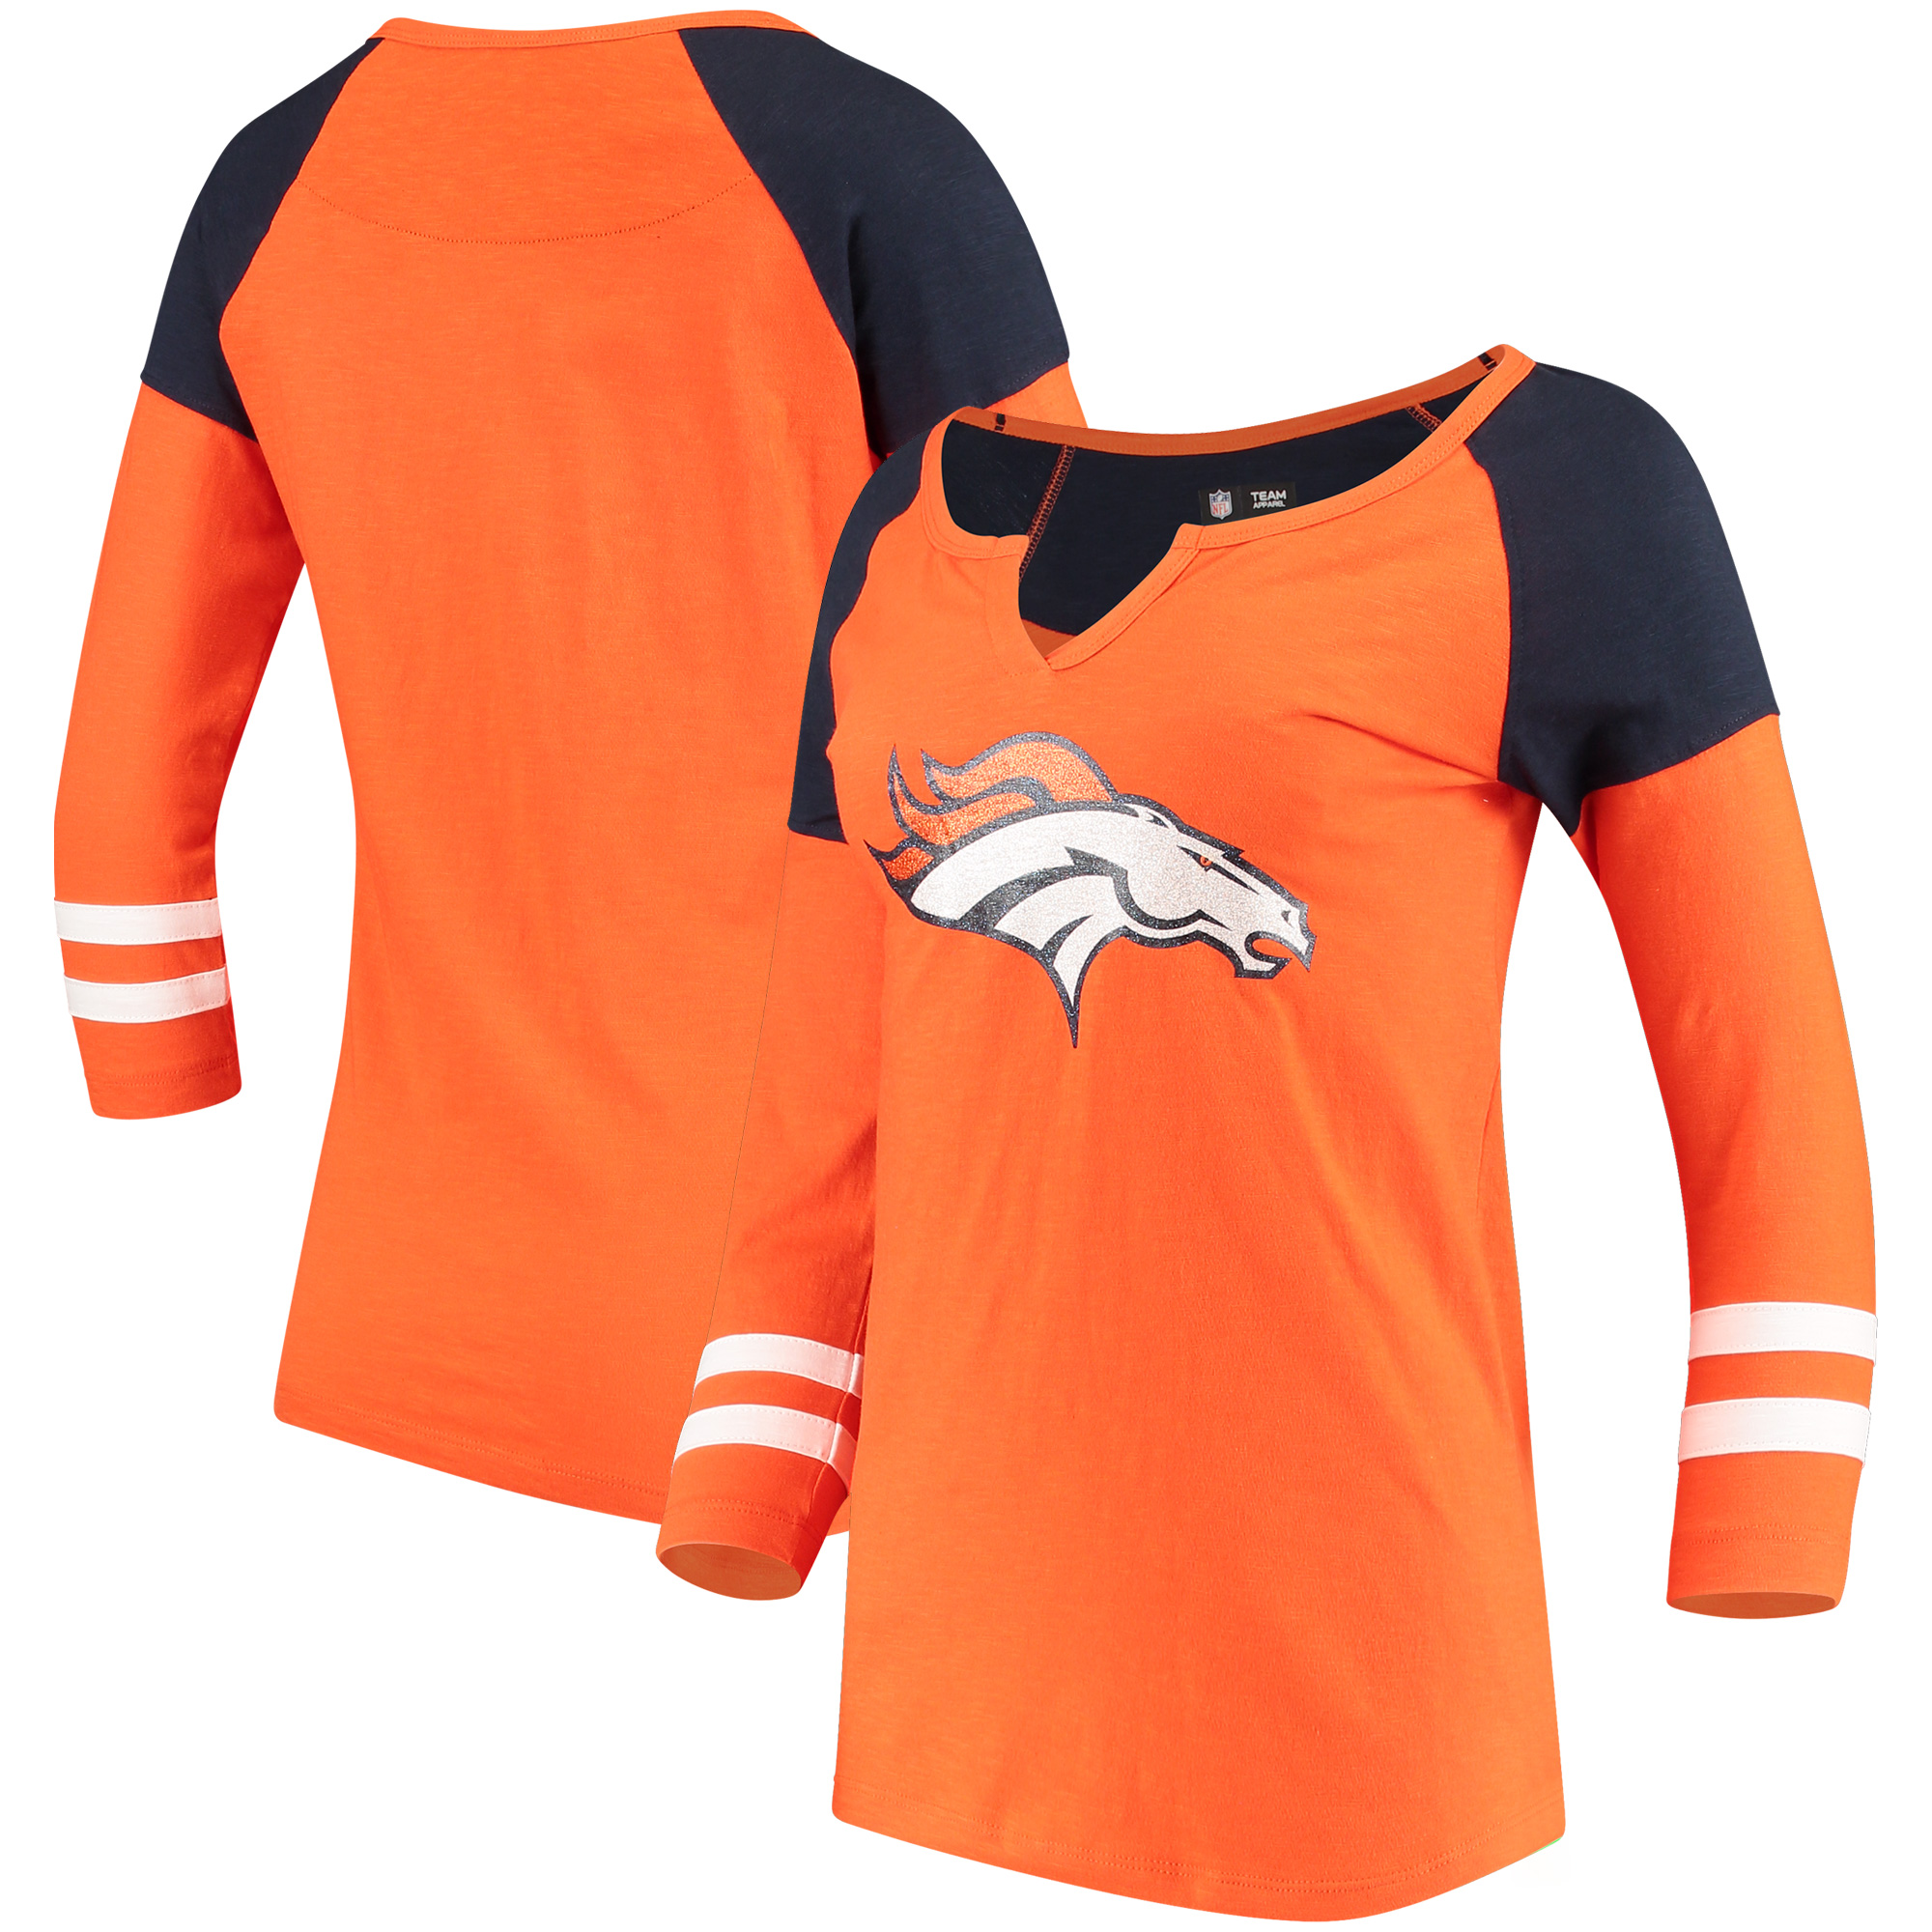 Denver Broncos 5th & Ocean by New Era Women's Split Slub Scoop Neck 3/4-Sleeve T-Shirt - Orange